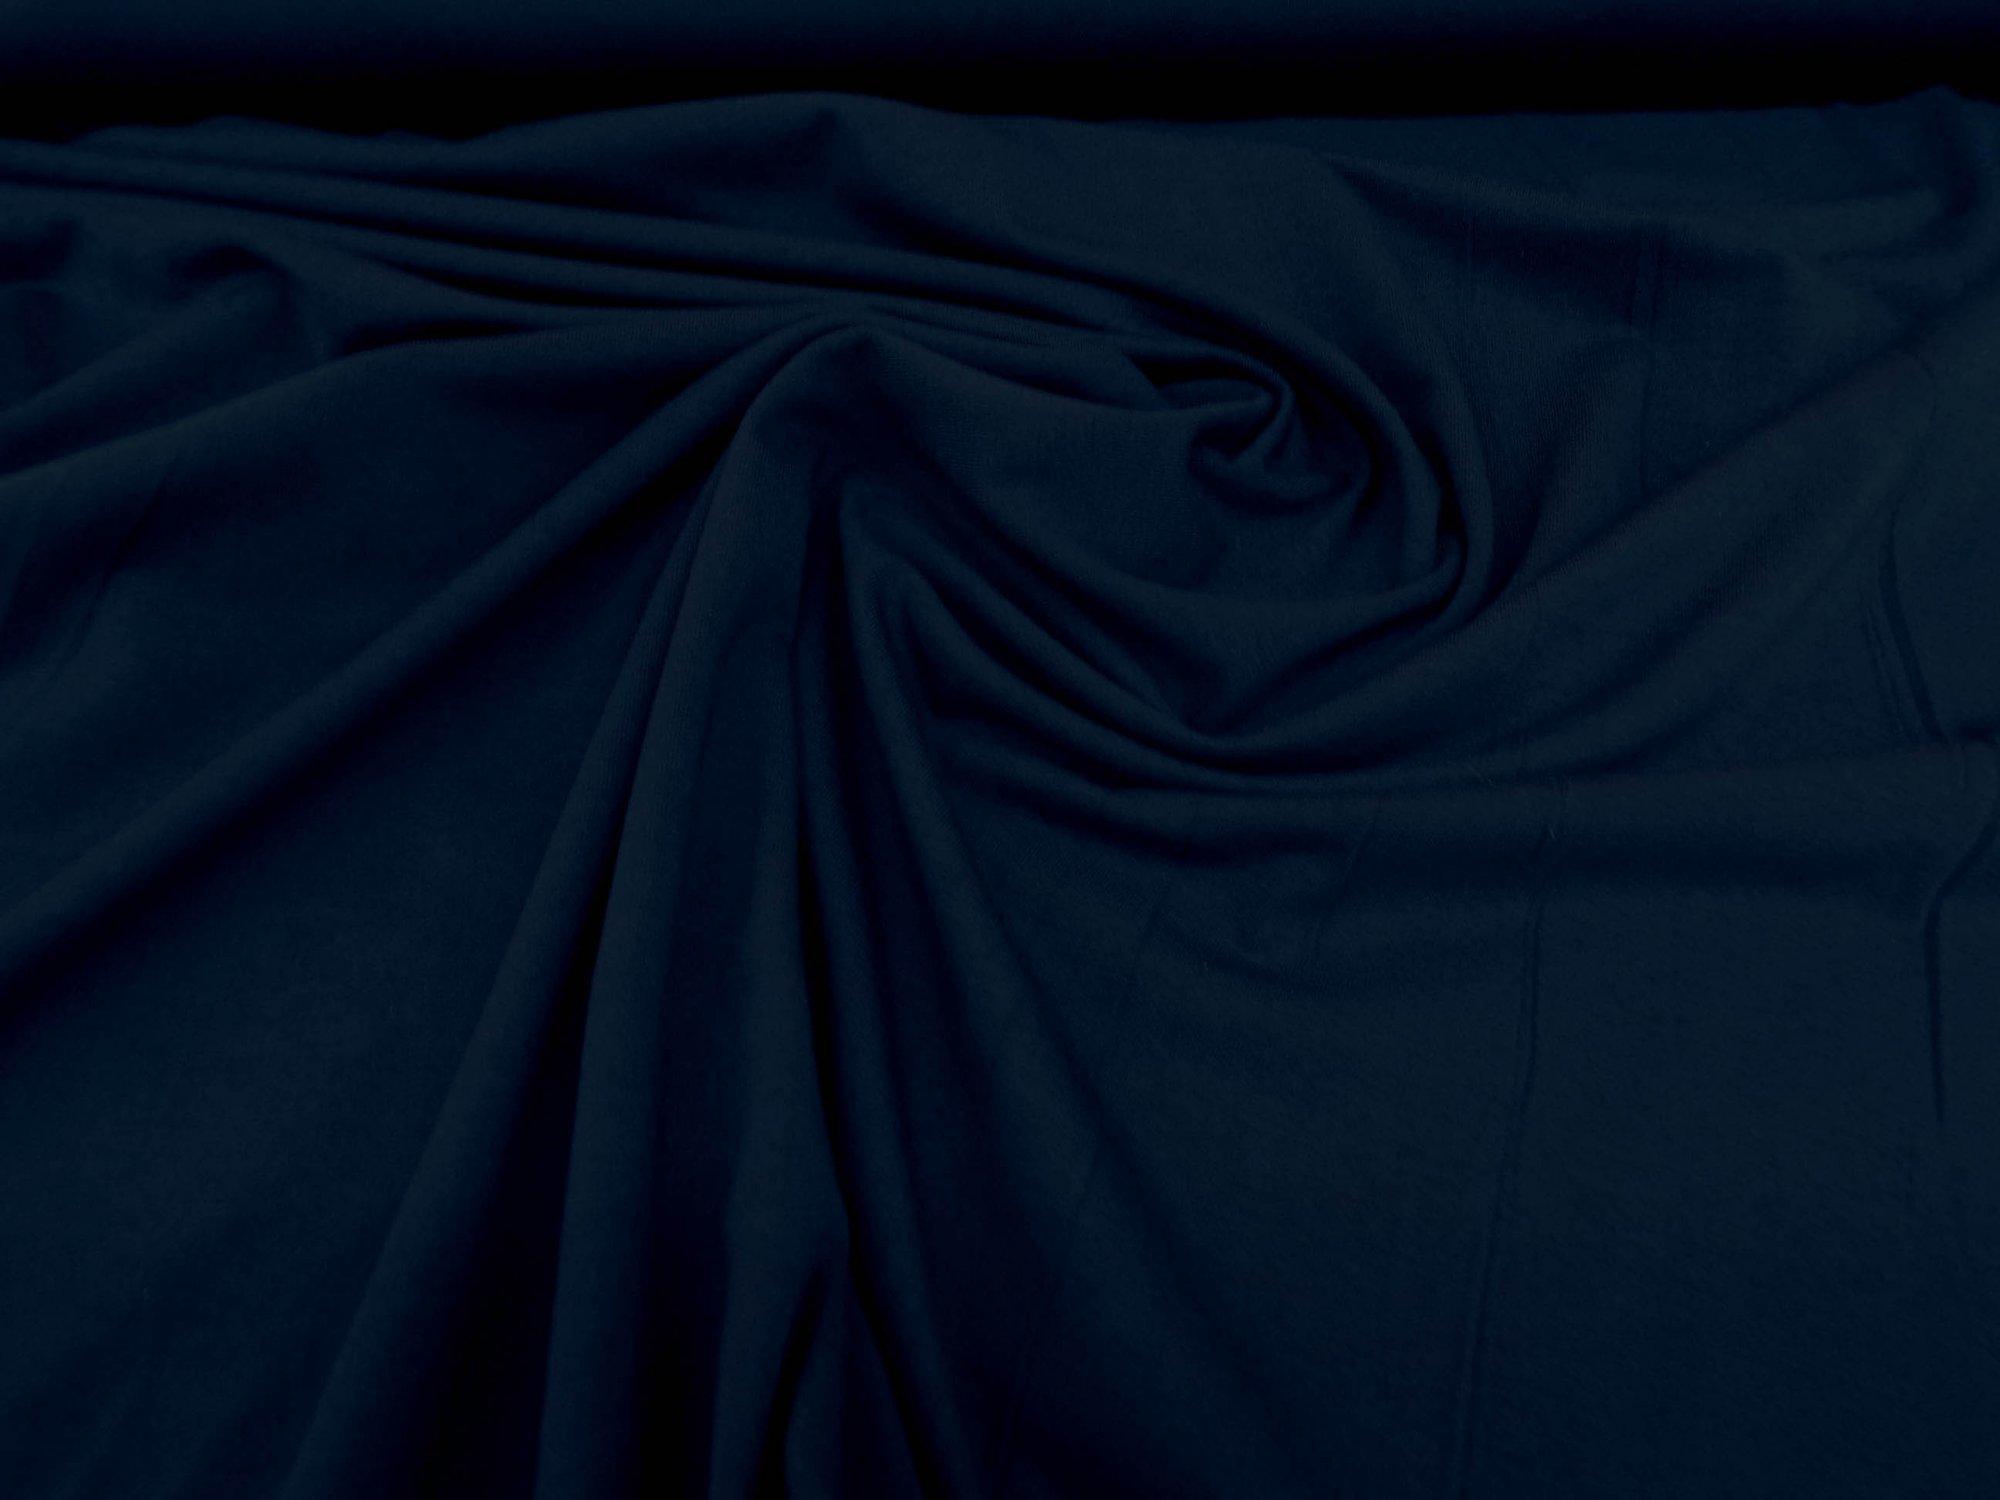 Cotton Jersey - Navy Blue - 5 oz